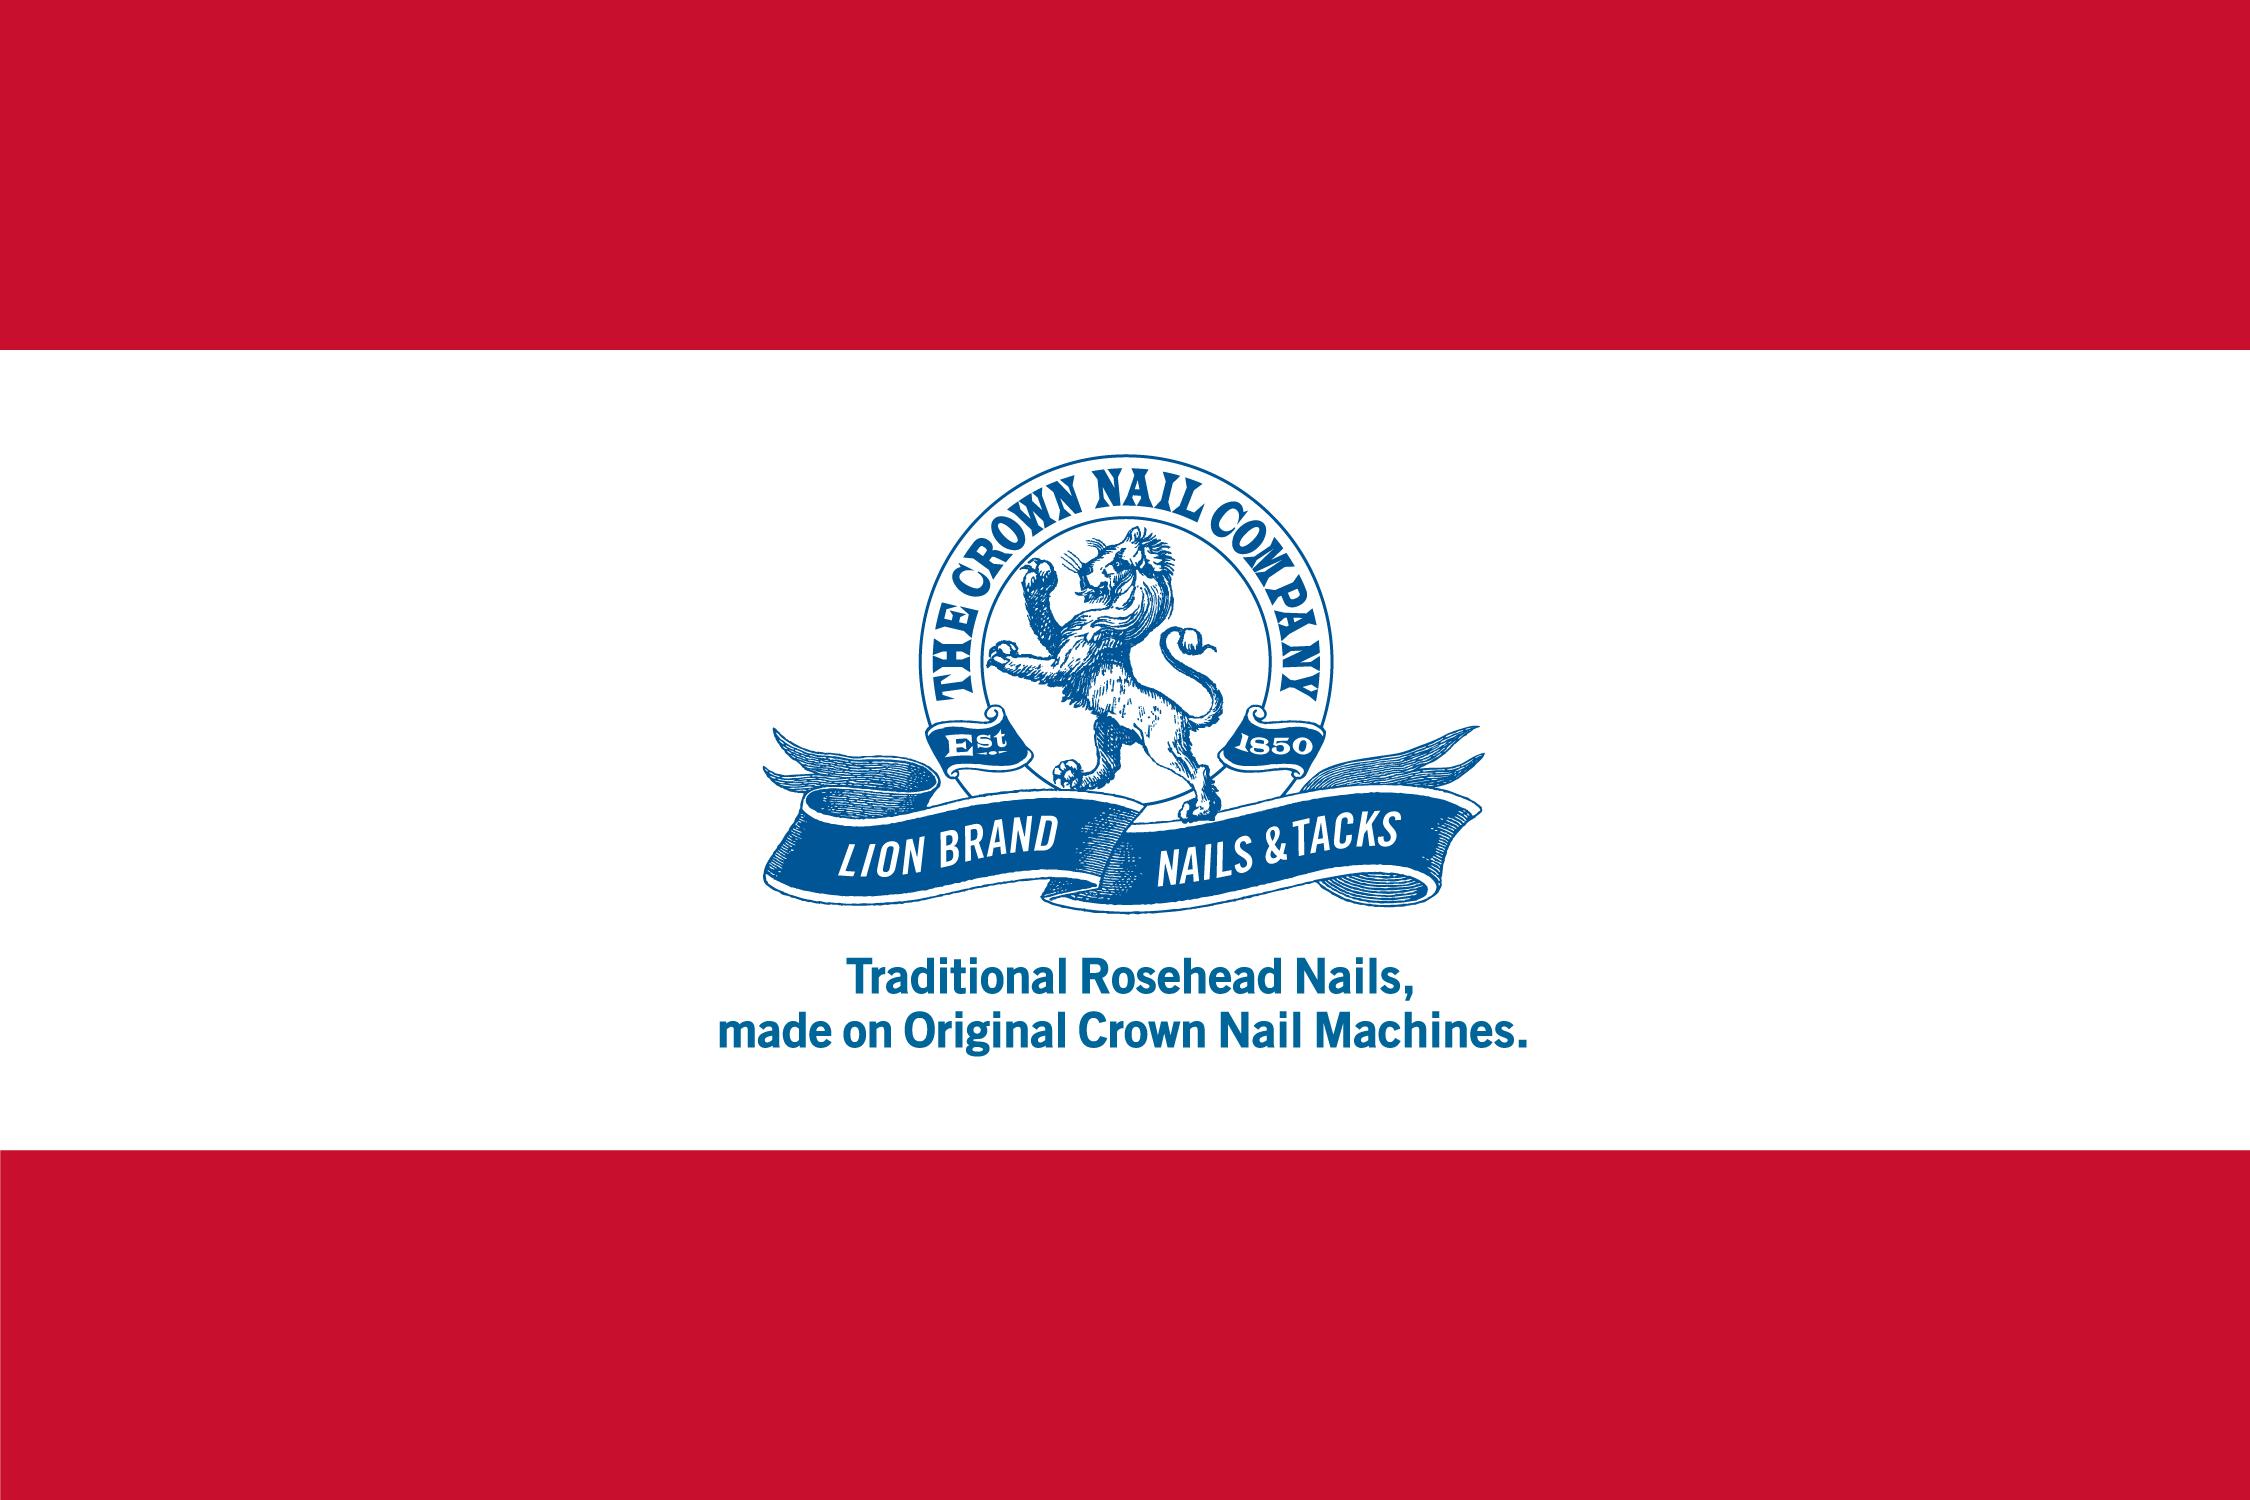 ROSEHEAD NAILS